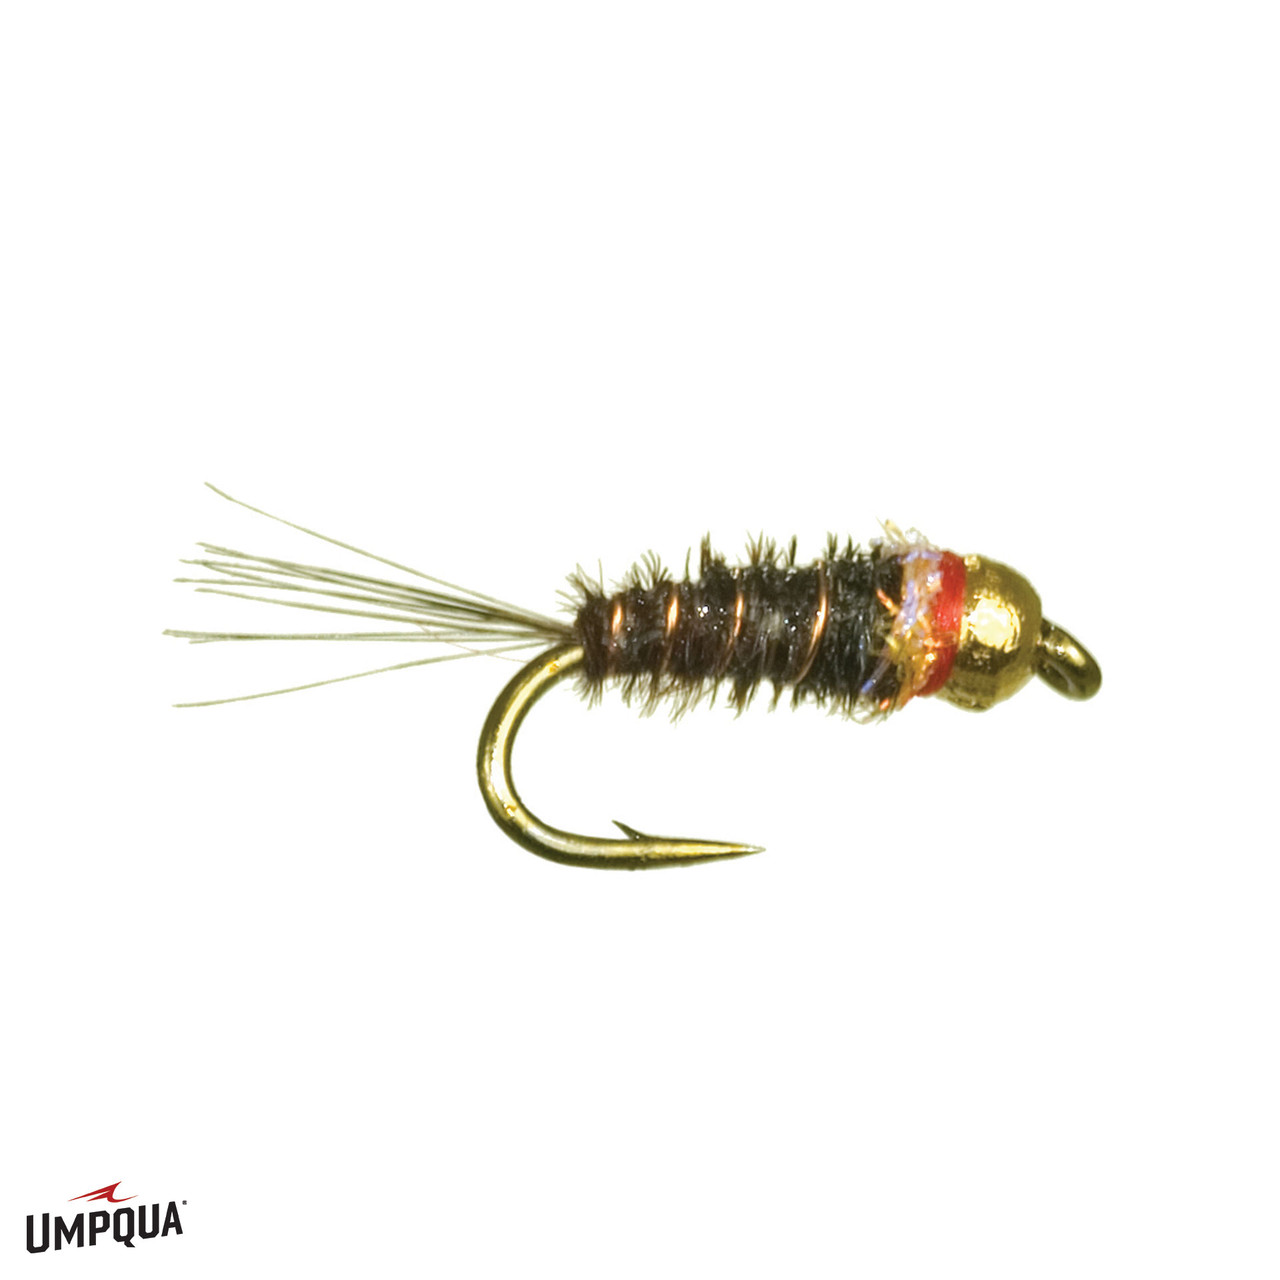 Umpqua Pheasant Tail Natural 2 Pack Nymph Fly Fishing Flies